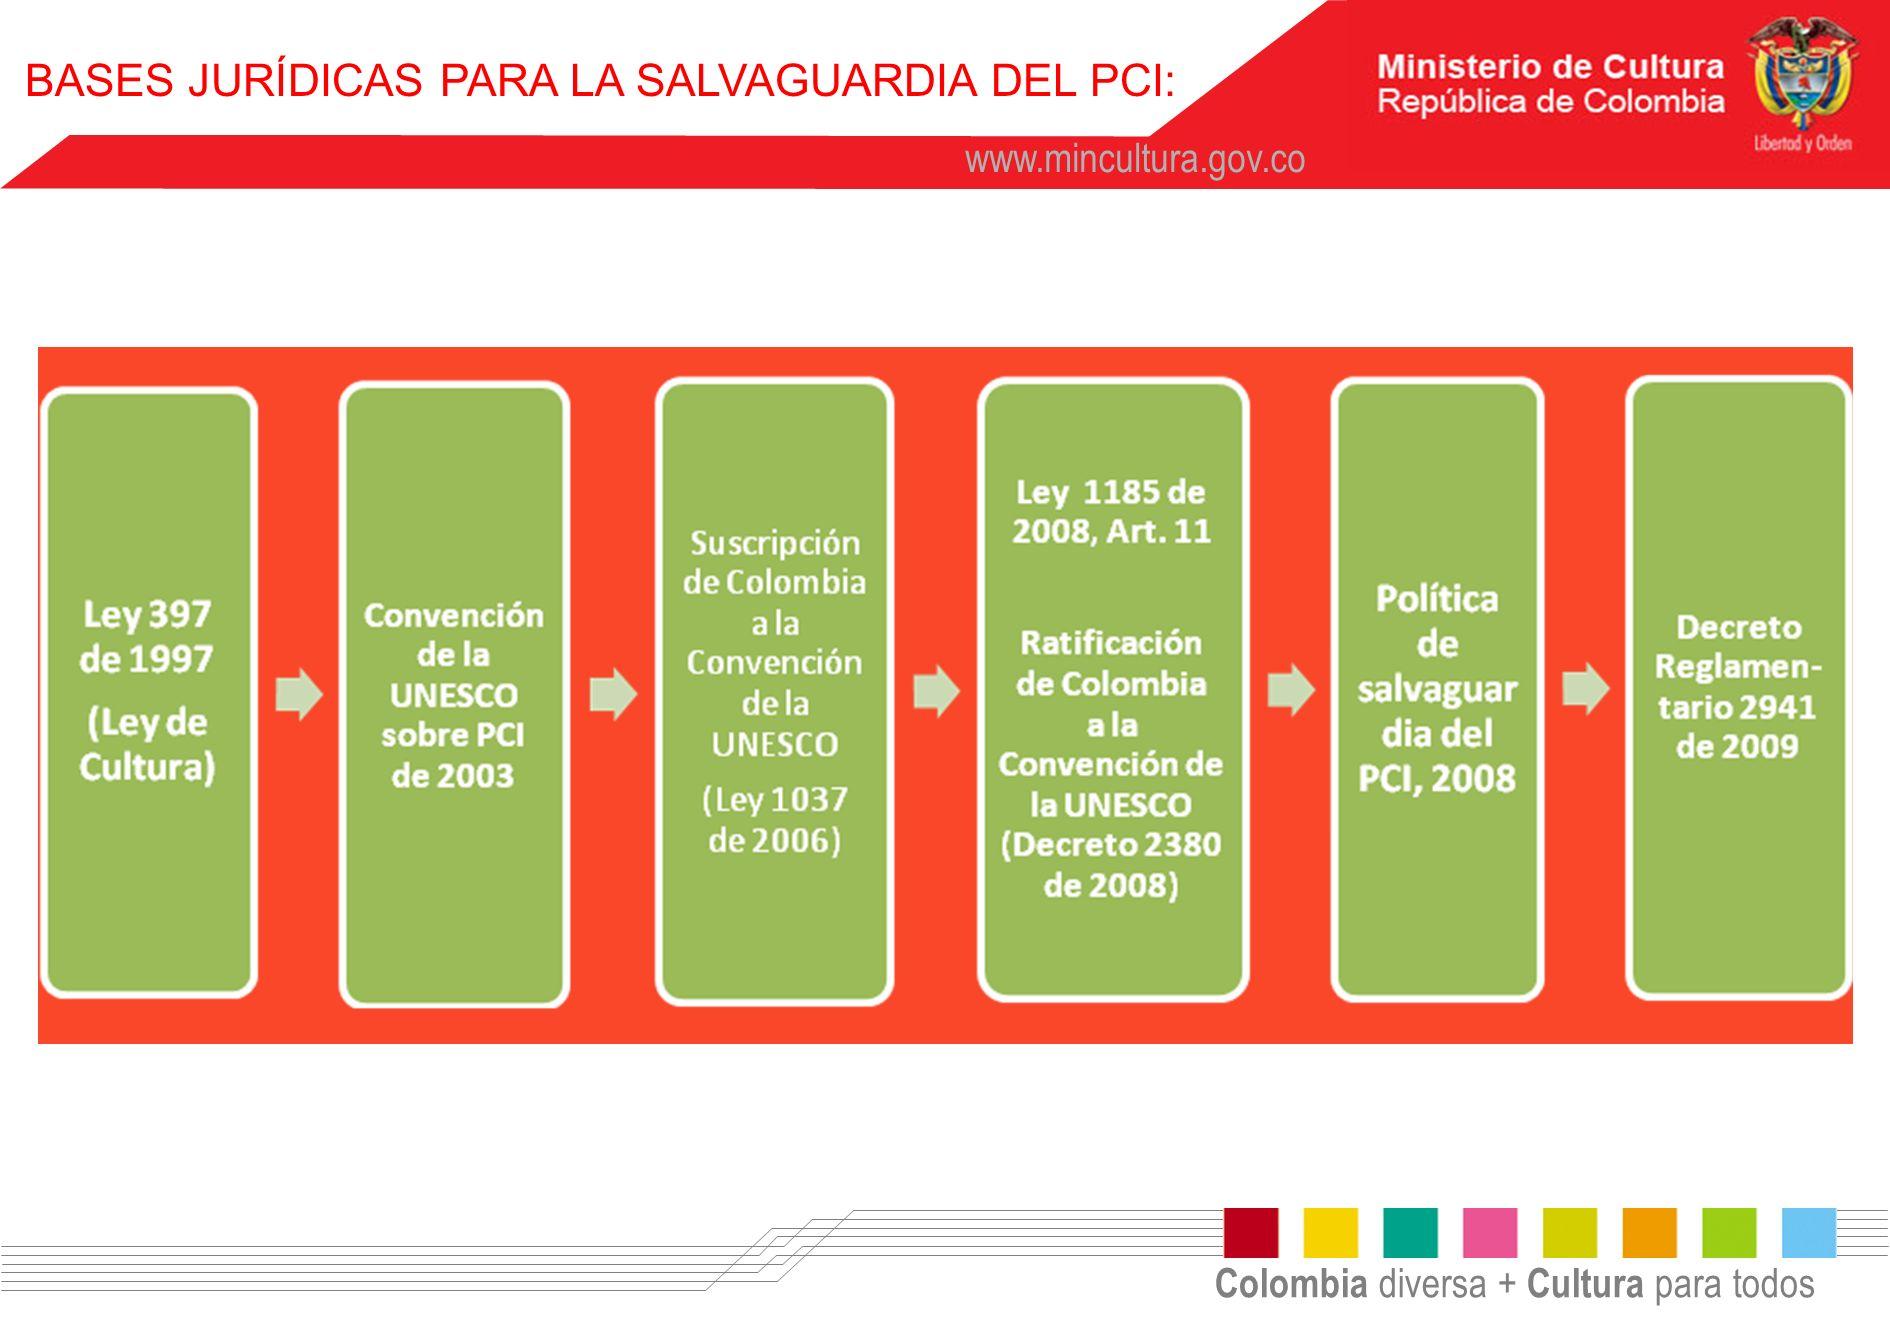 BASES JURÍDICAS PARA LA SALVAGUARDIA DEL PCI: